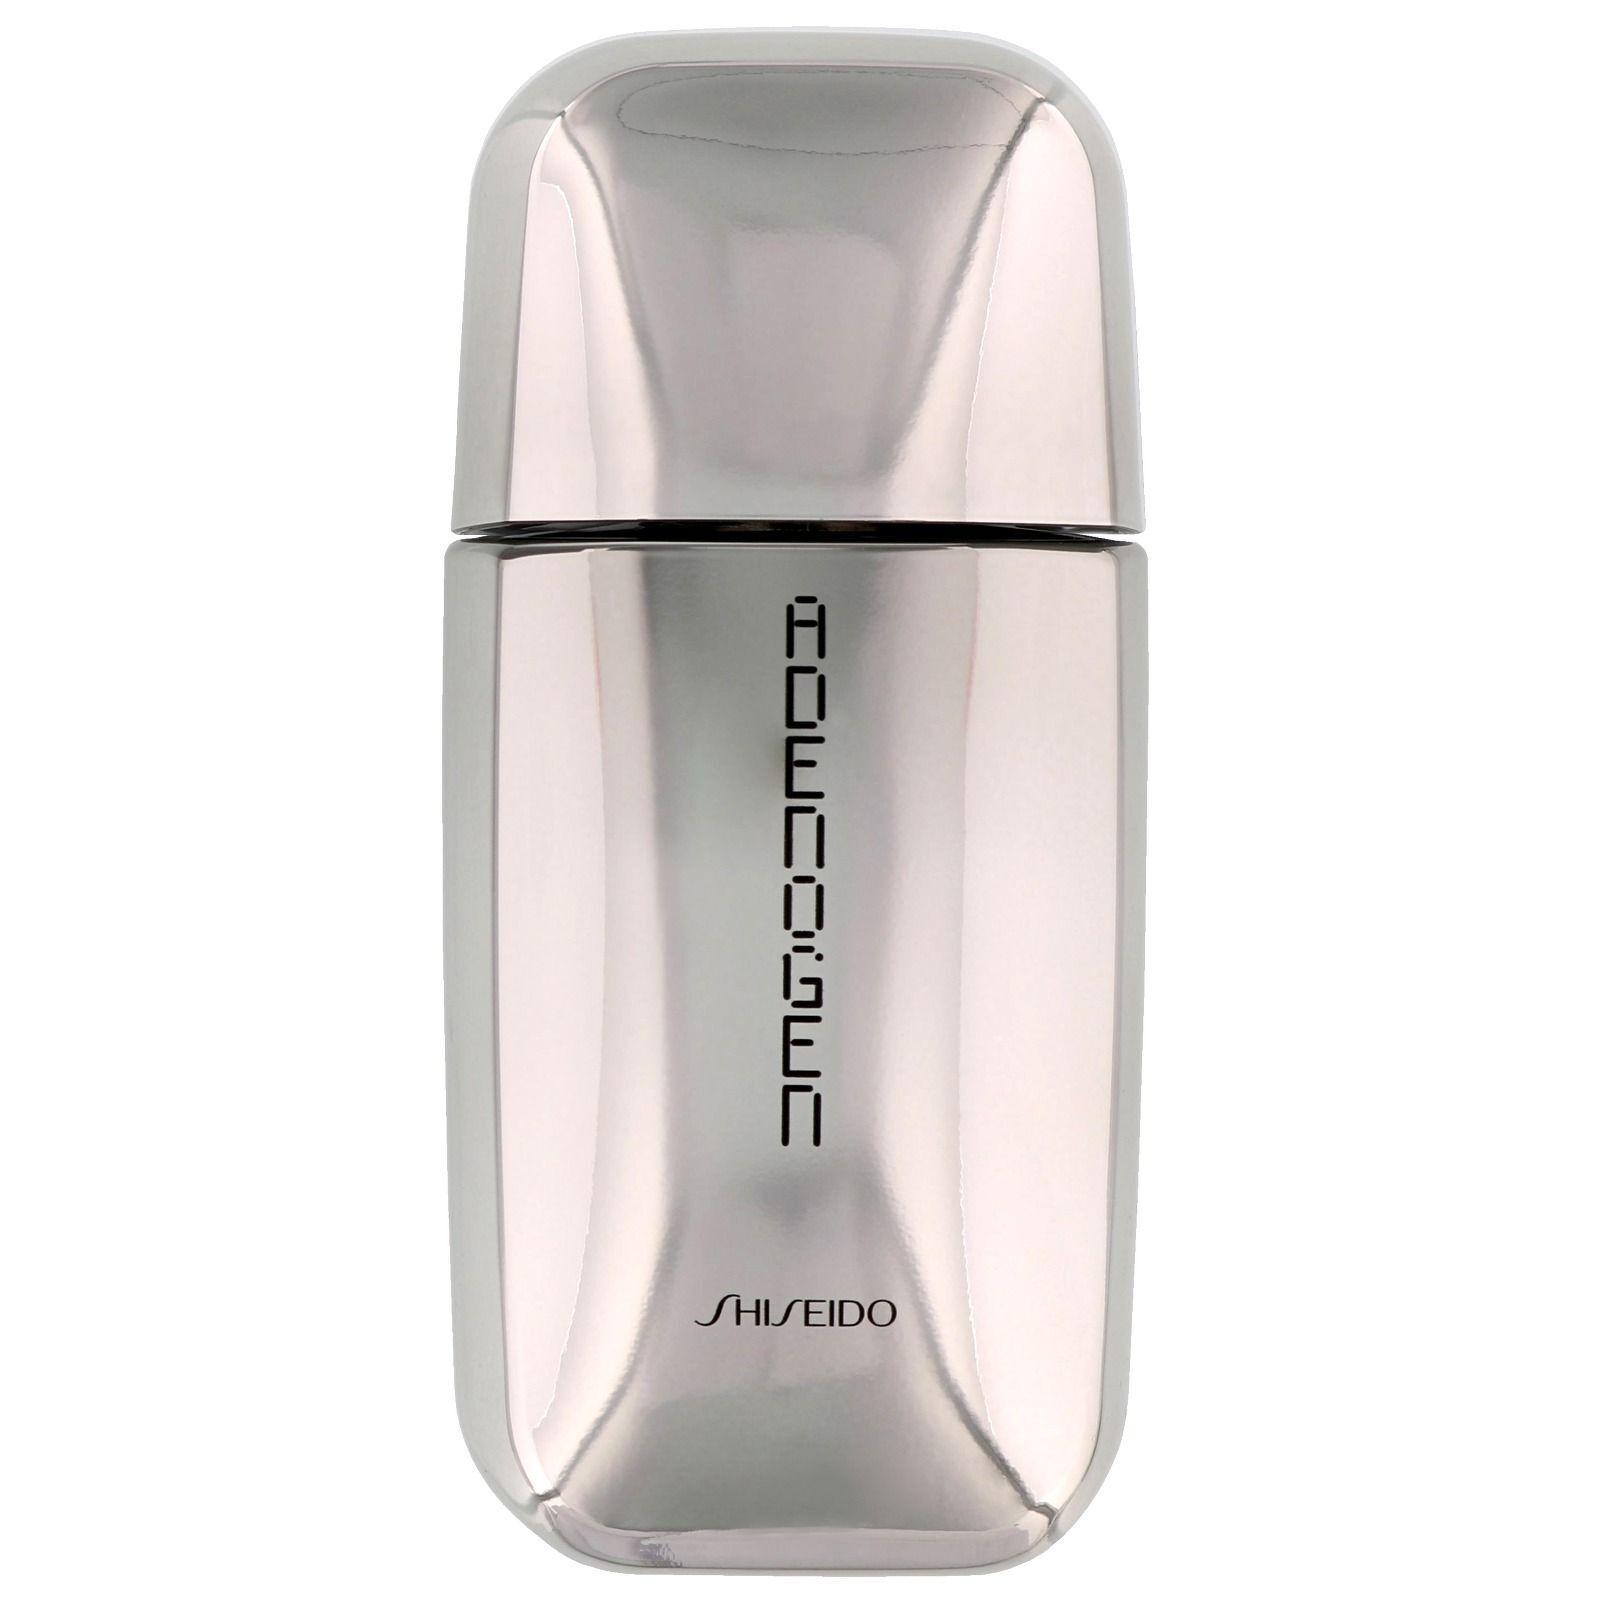 Shiseido Haircare Adenogen Hair Energizing Formula 150ml / 5 oz.